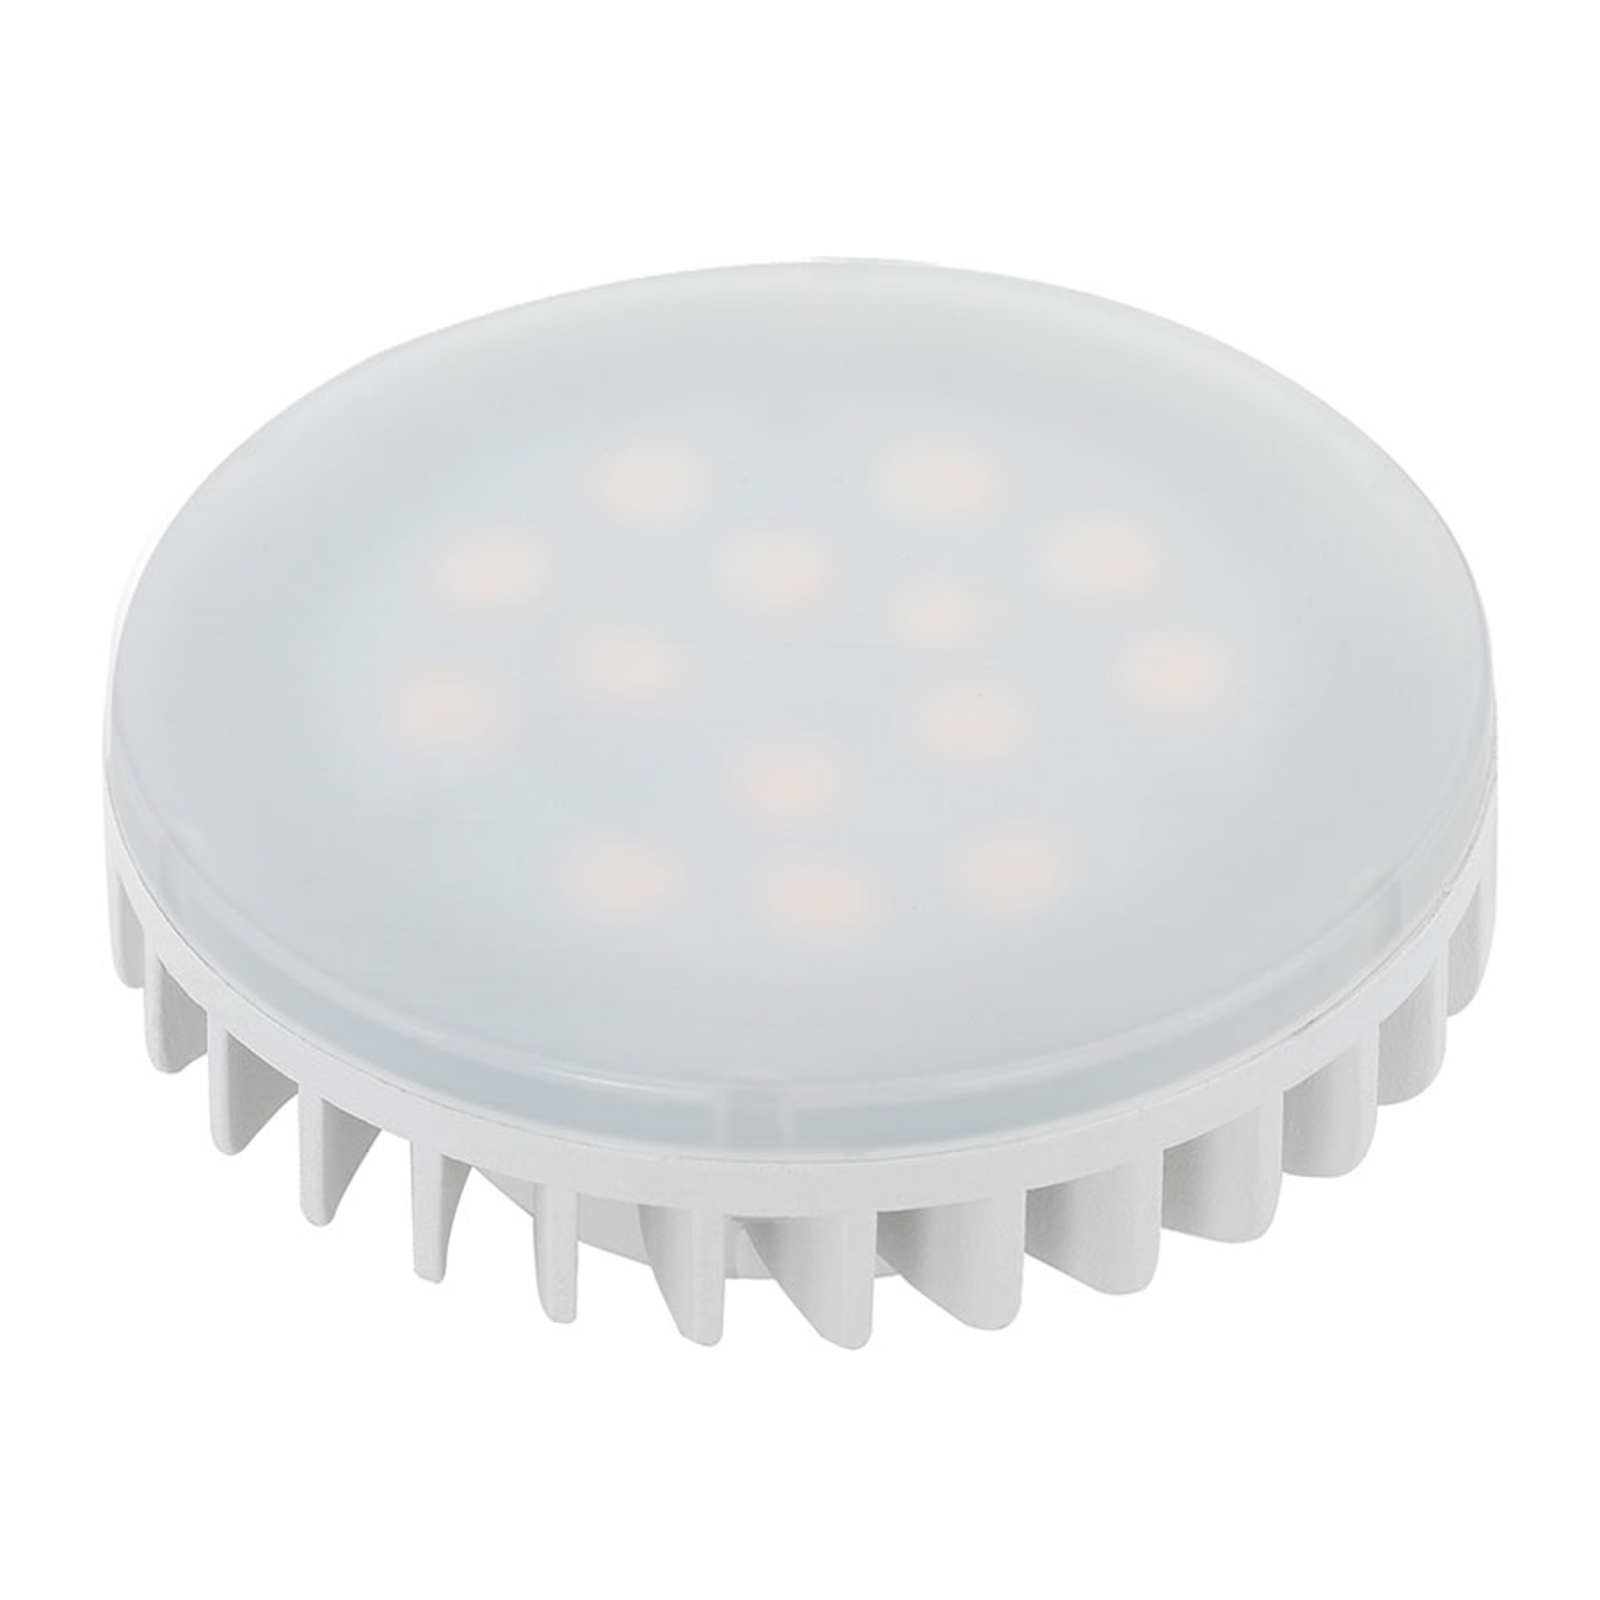 Żarówka LED GX53 6W, ciepła biel, matowa